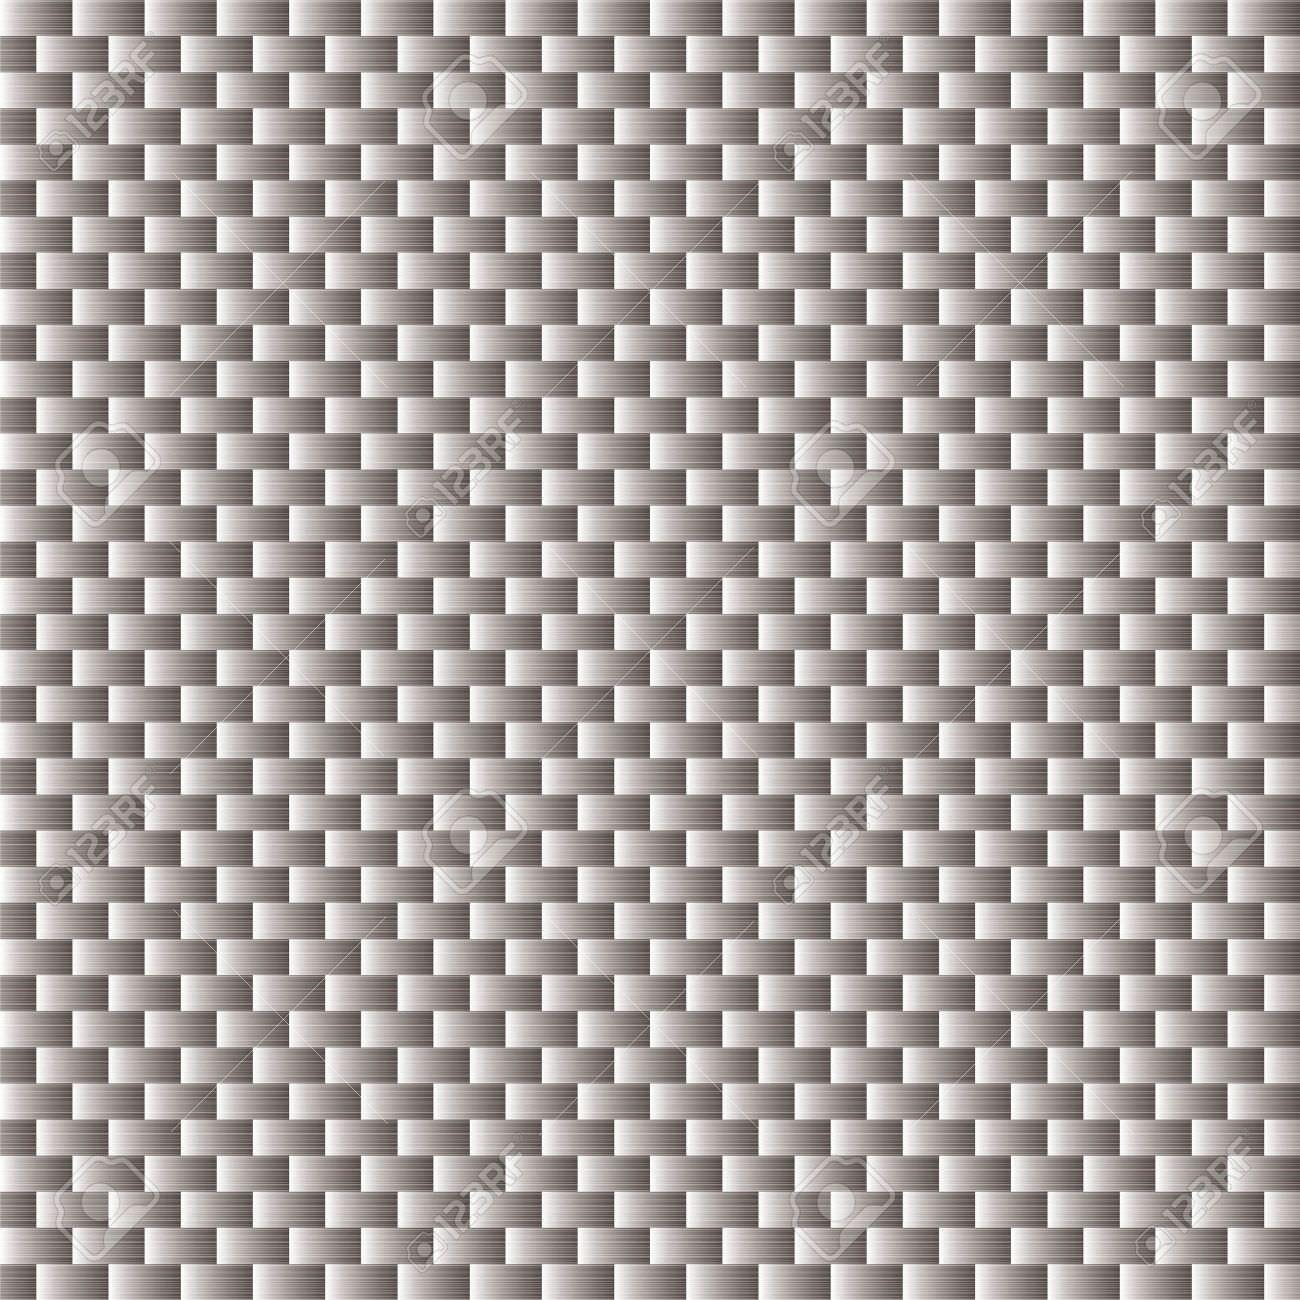 woven carbon fiber texture1